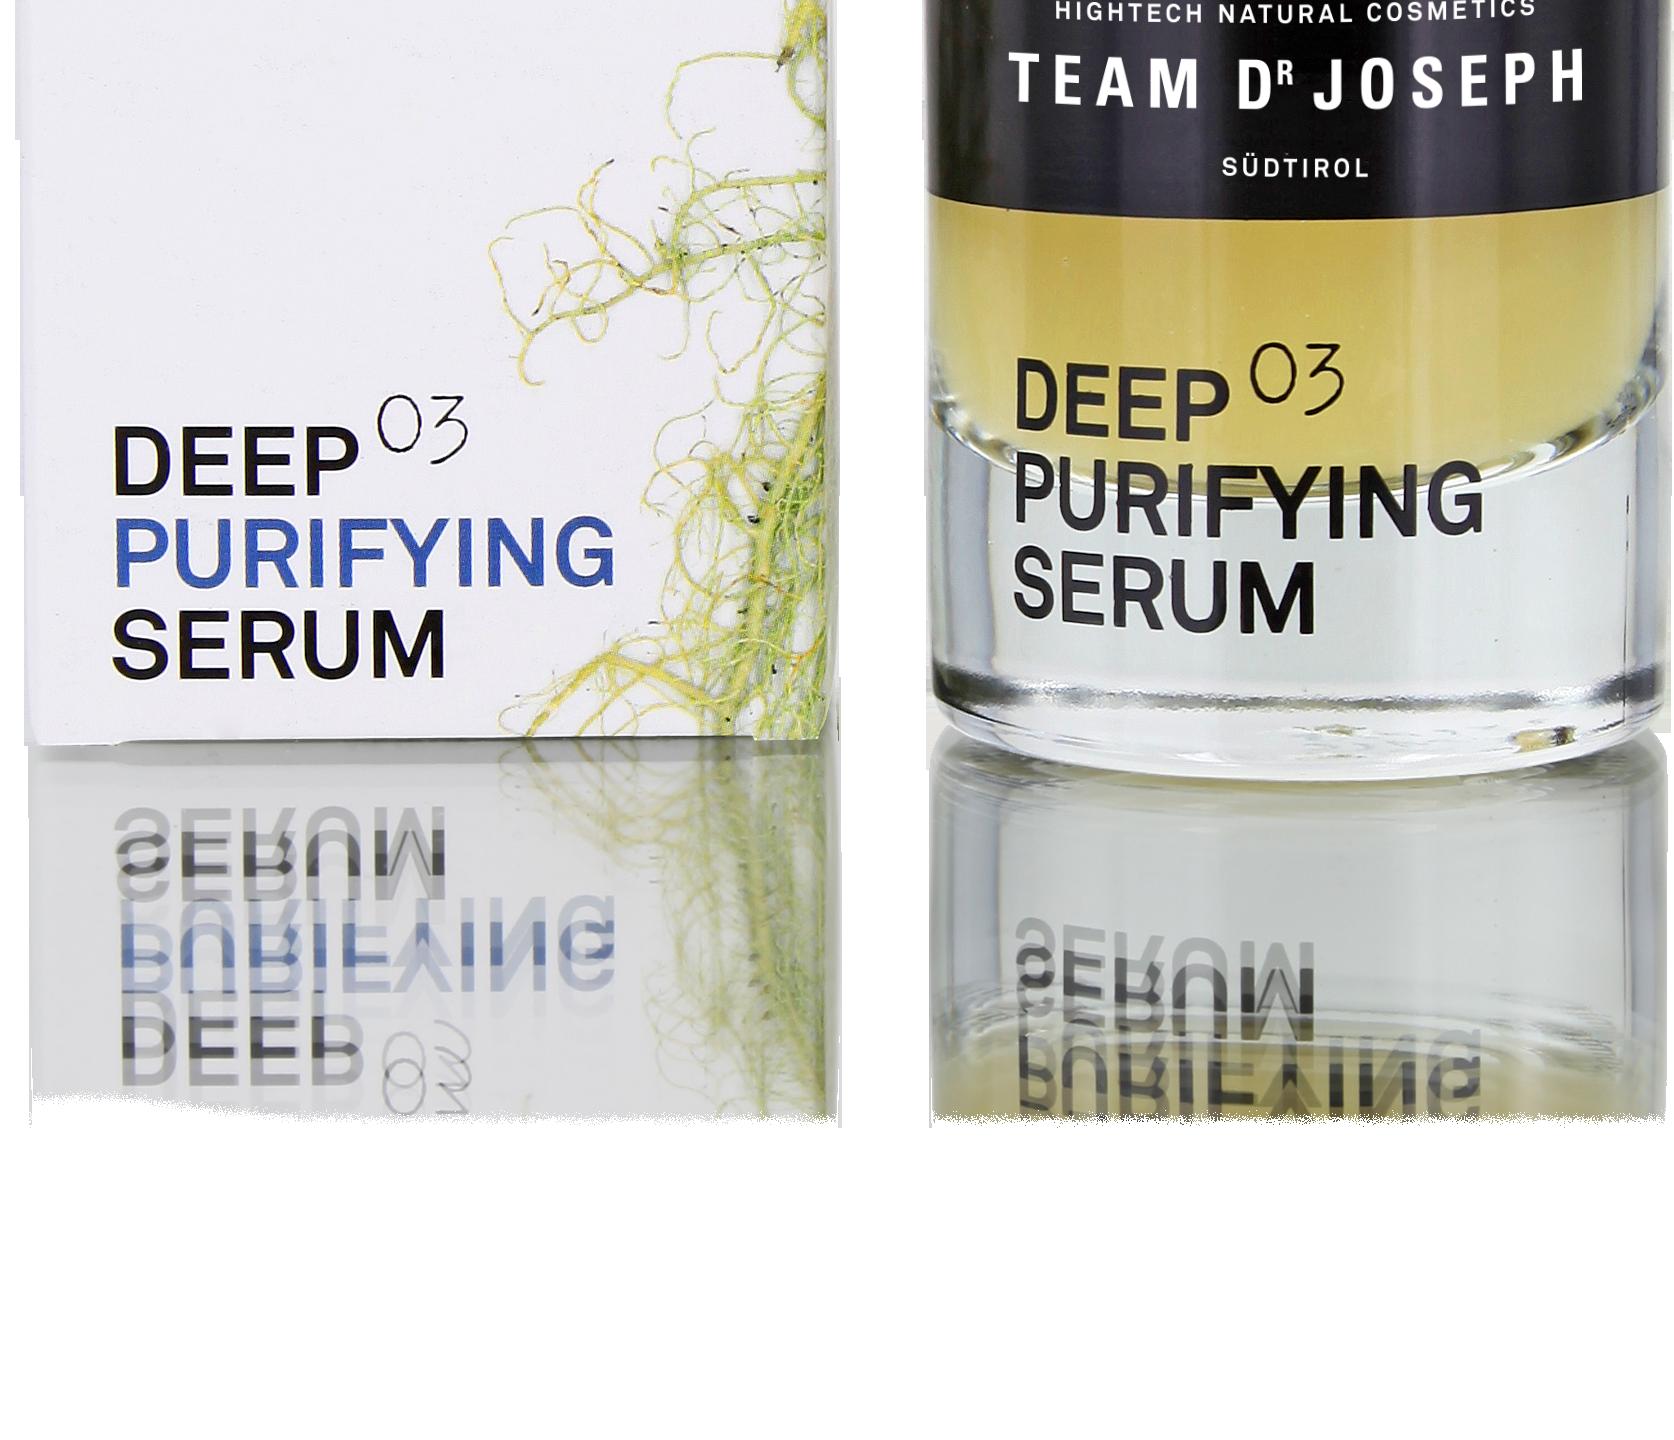 Deep Purifying Serum